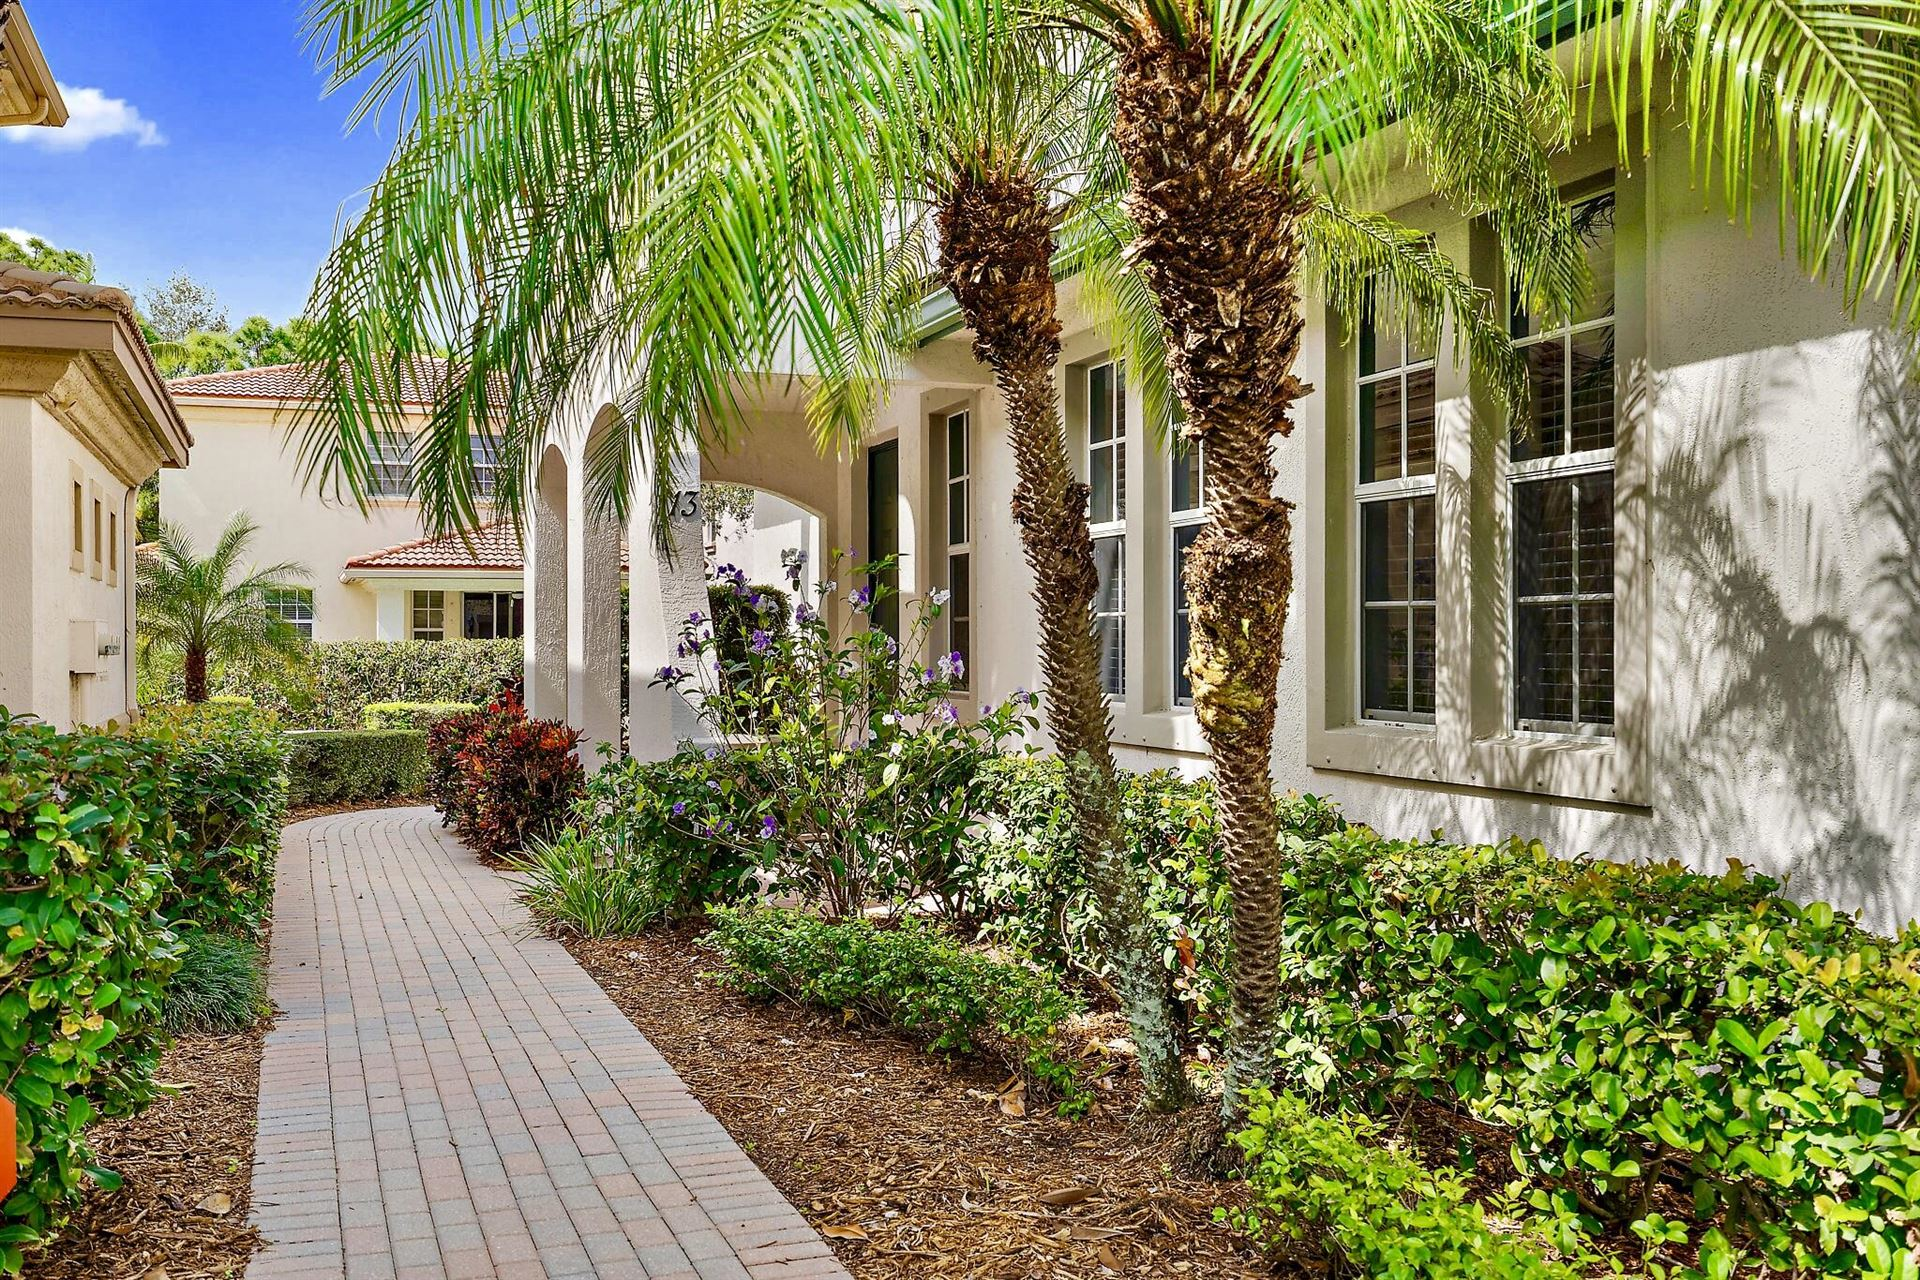 Photo of 113 Evergrene Parkway #3-A, Palm Beach Gardens, FL 33410 (MLS # RX-10743235)